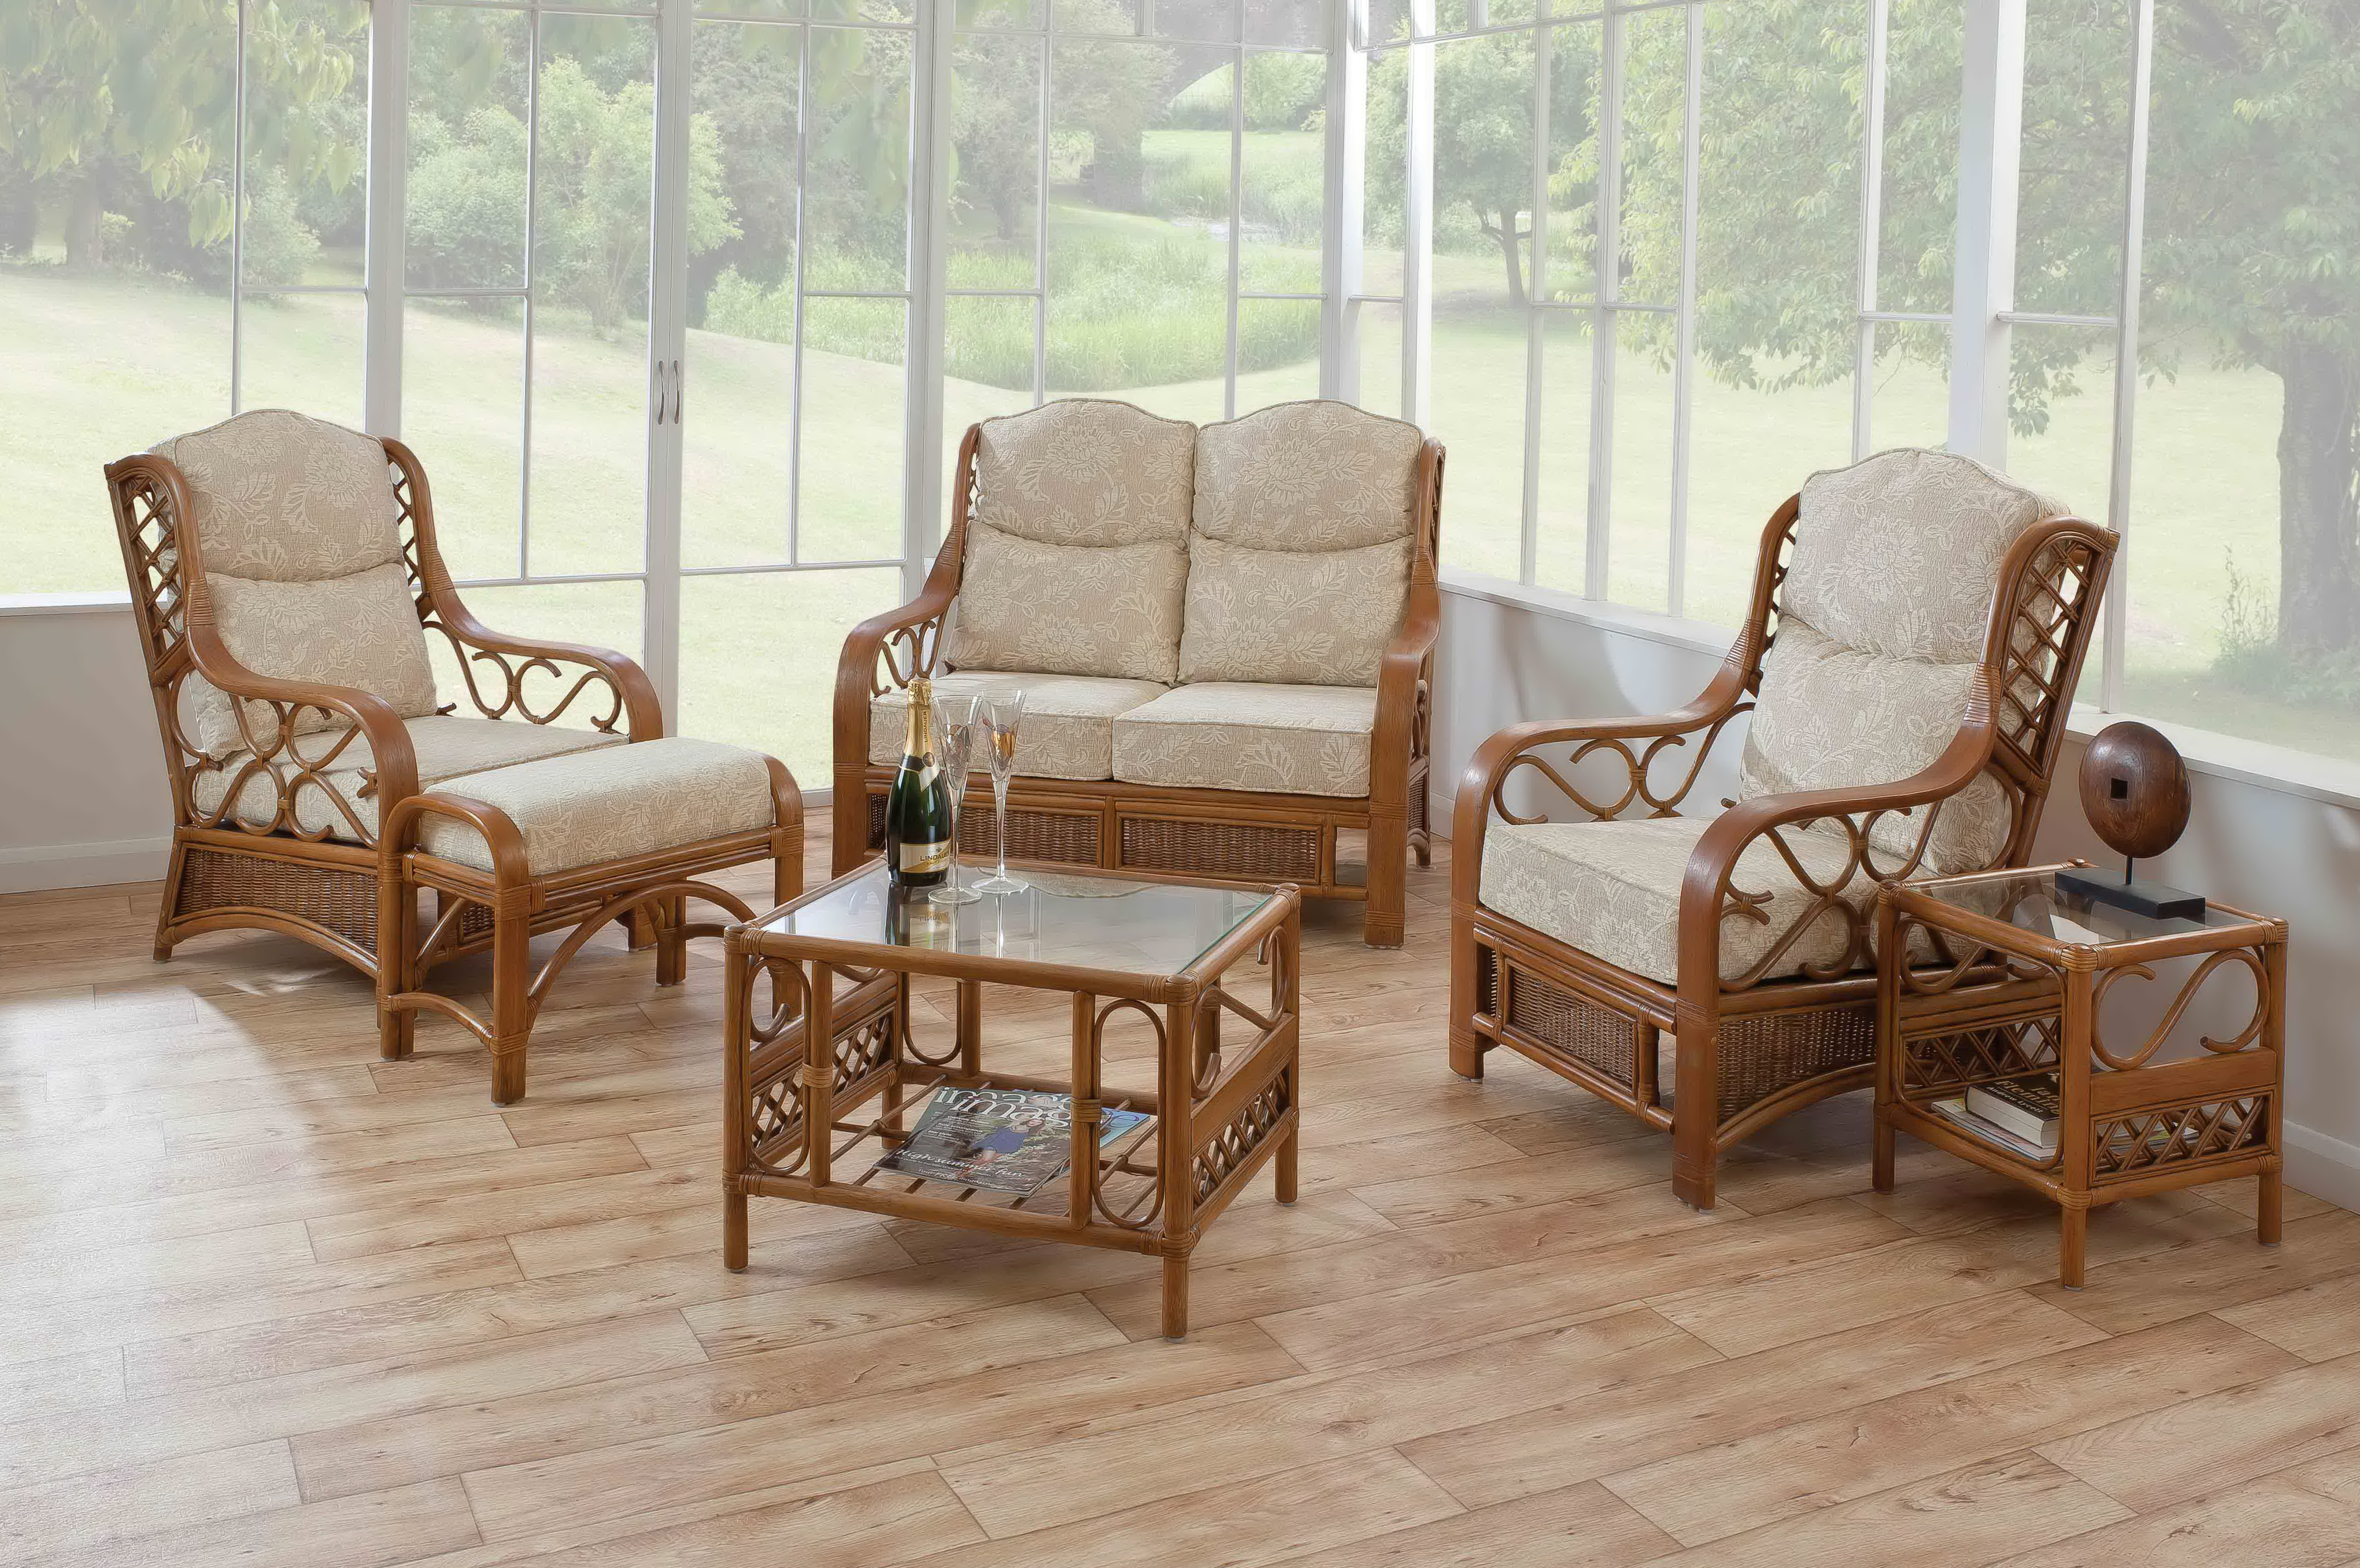 Replacement Sofa Cushions Ashley Home Design Ideas